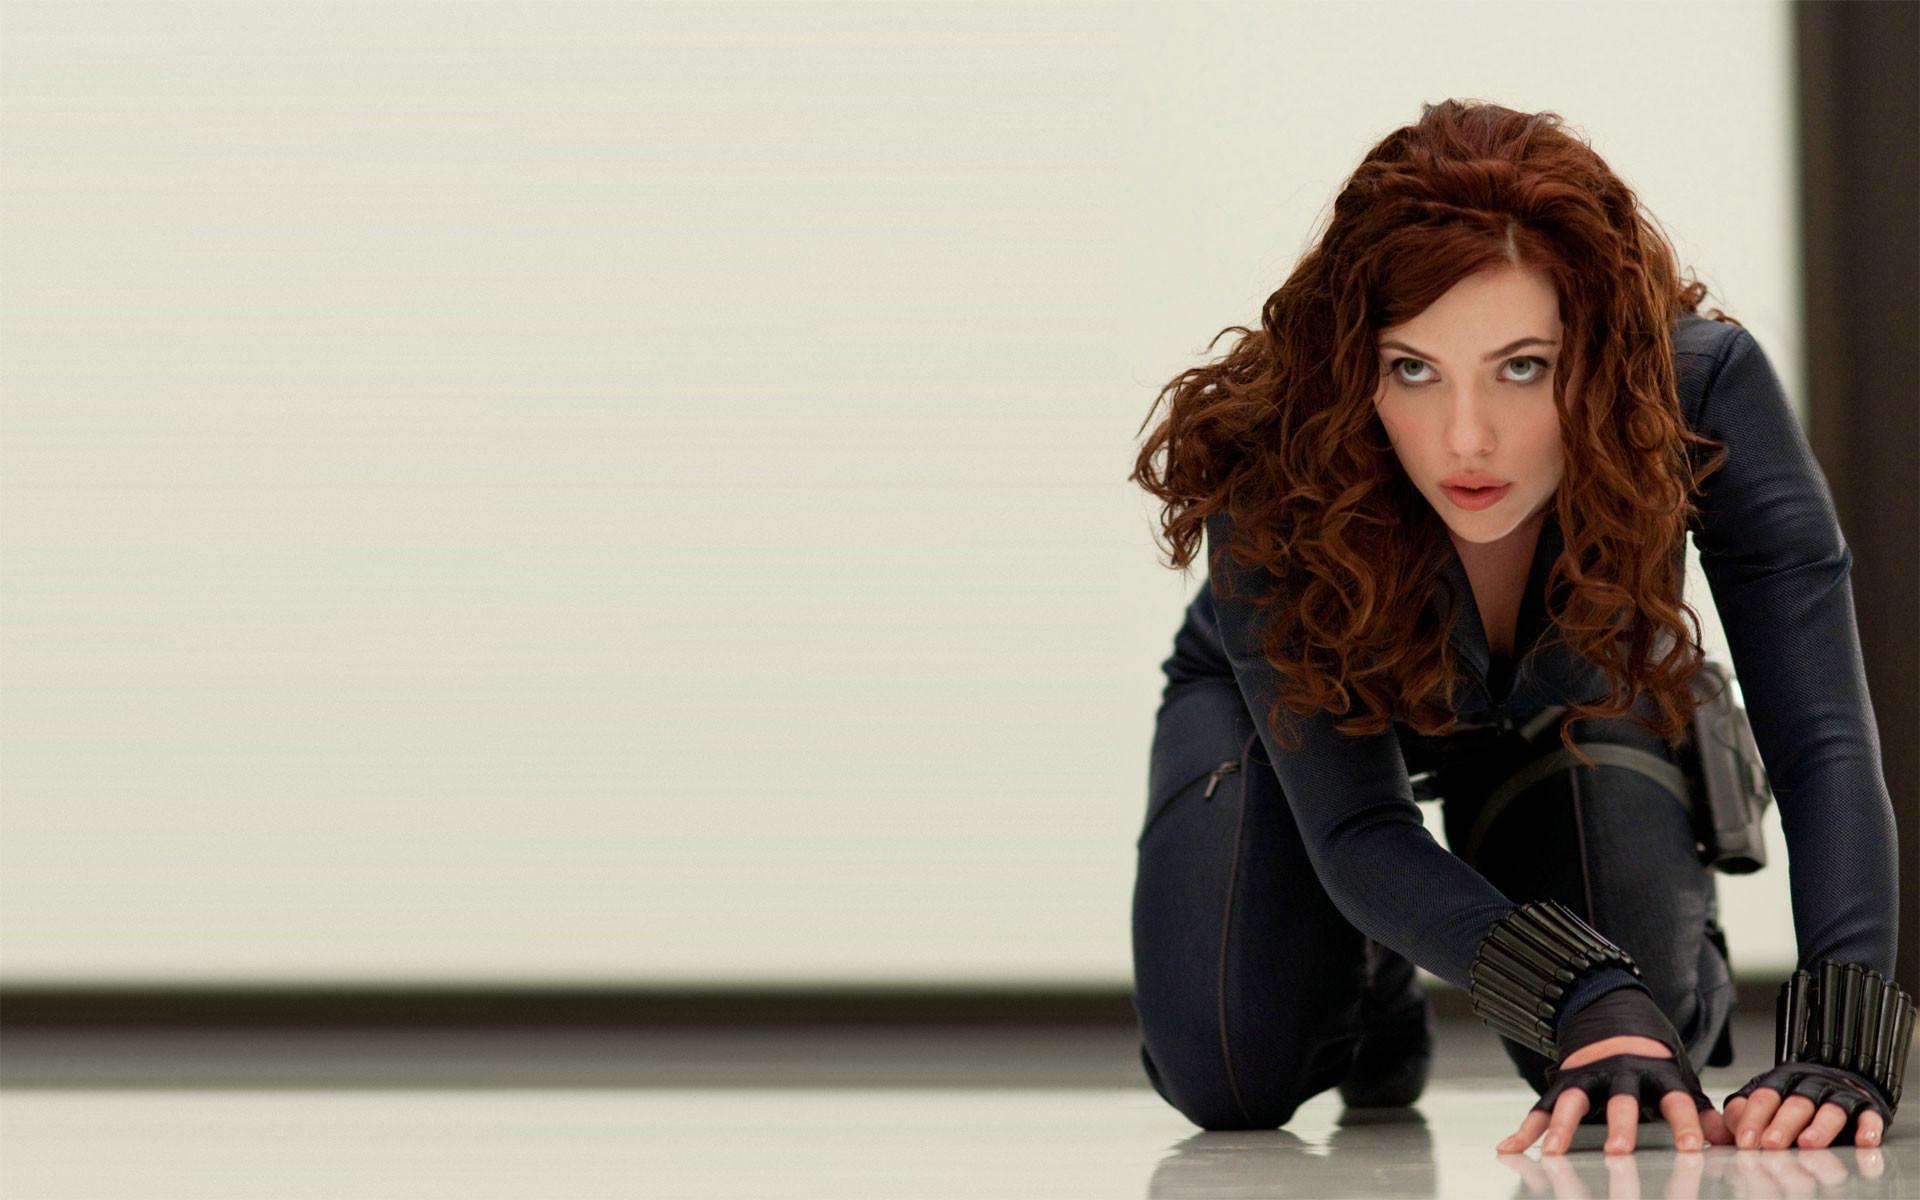 High Quality Hds Pics Of Scarlett Johansson As Redhead: Scarlett Johansson Black Widow Wallpaper (76+ Images